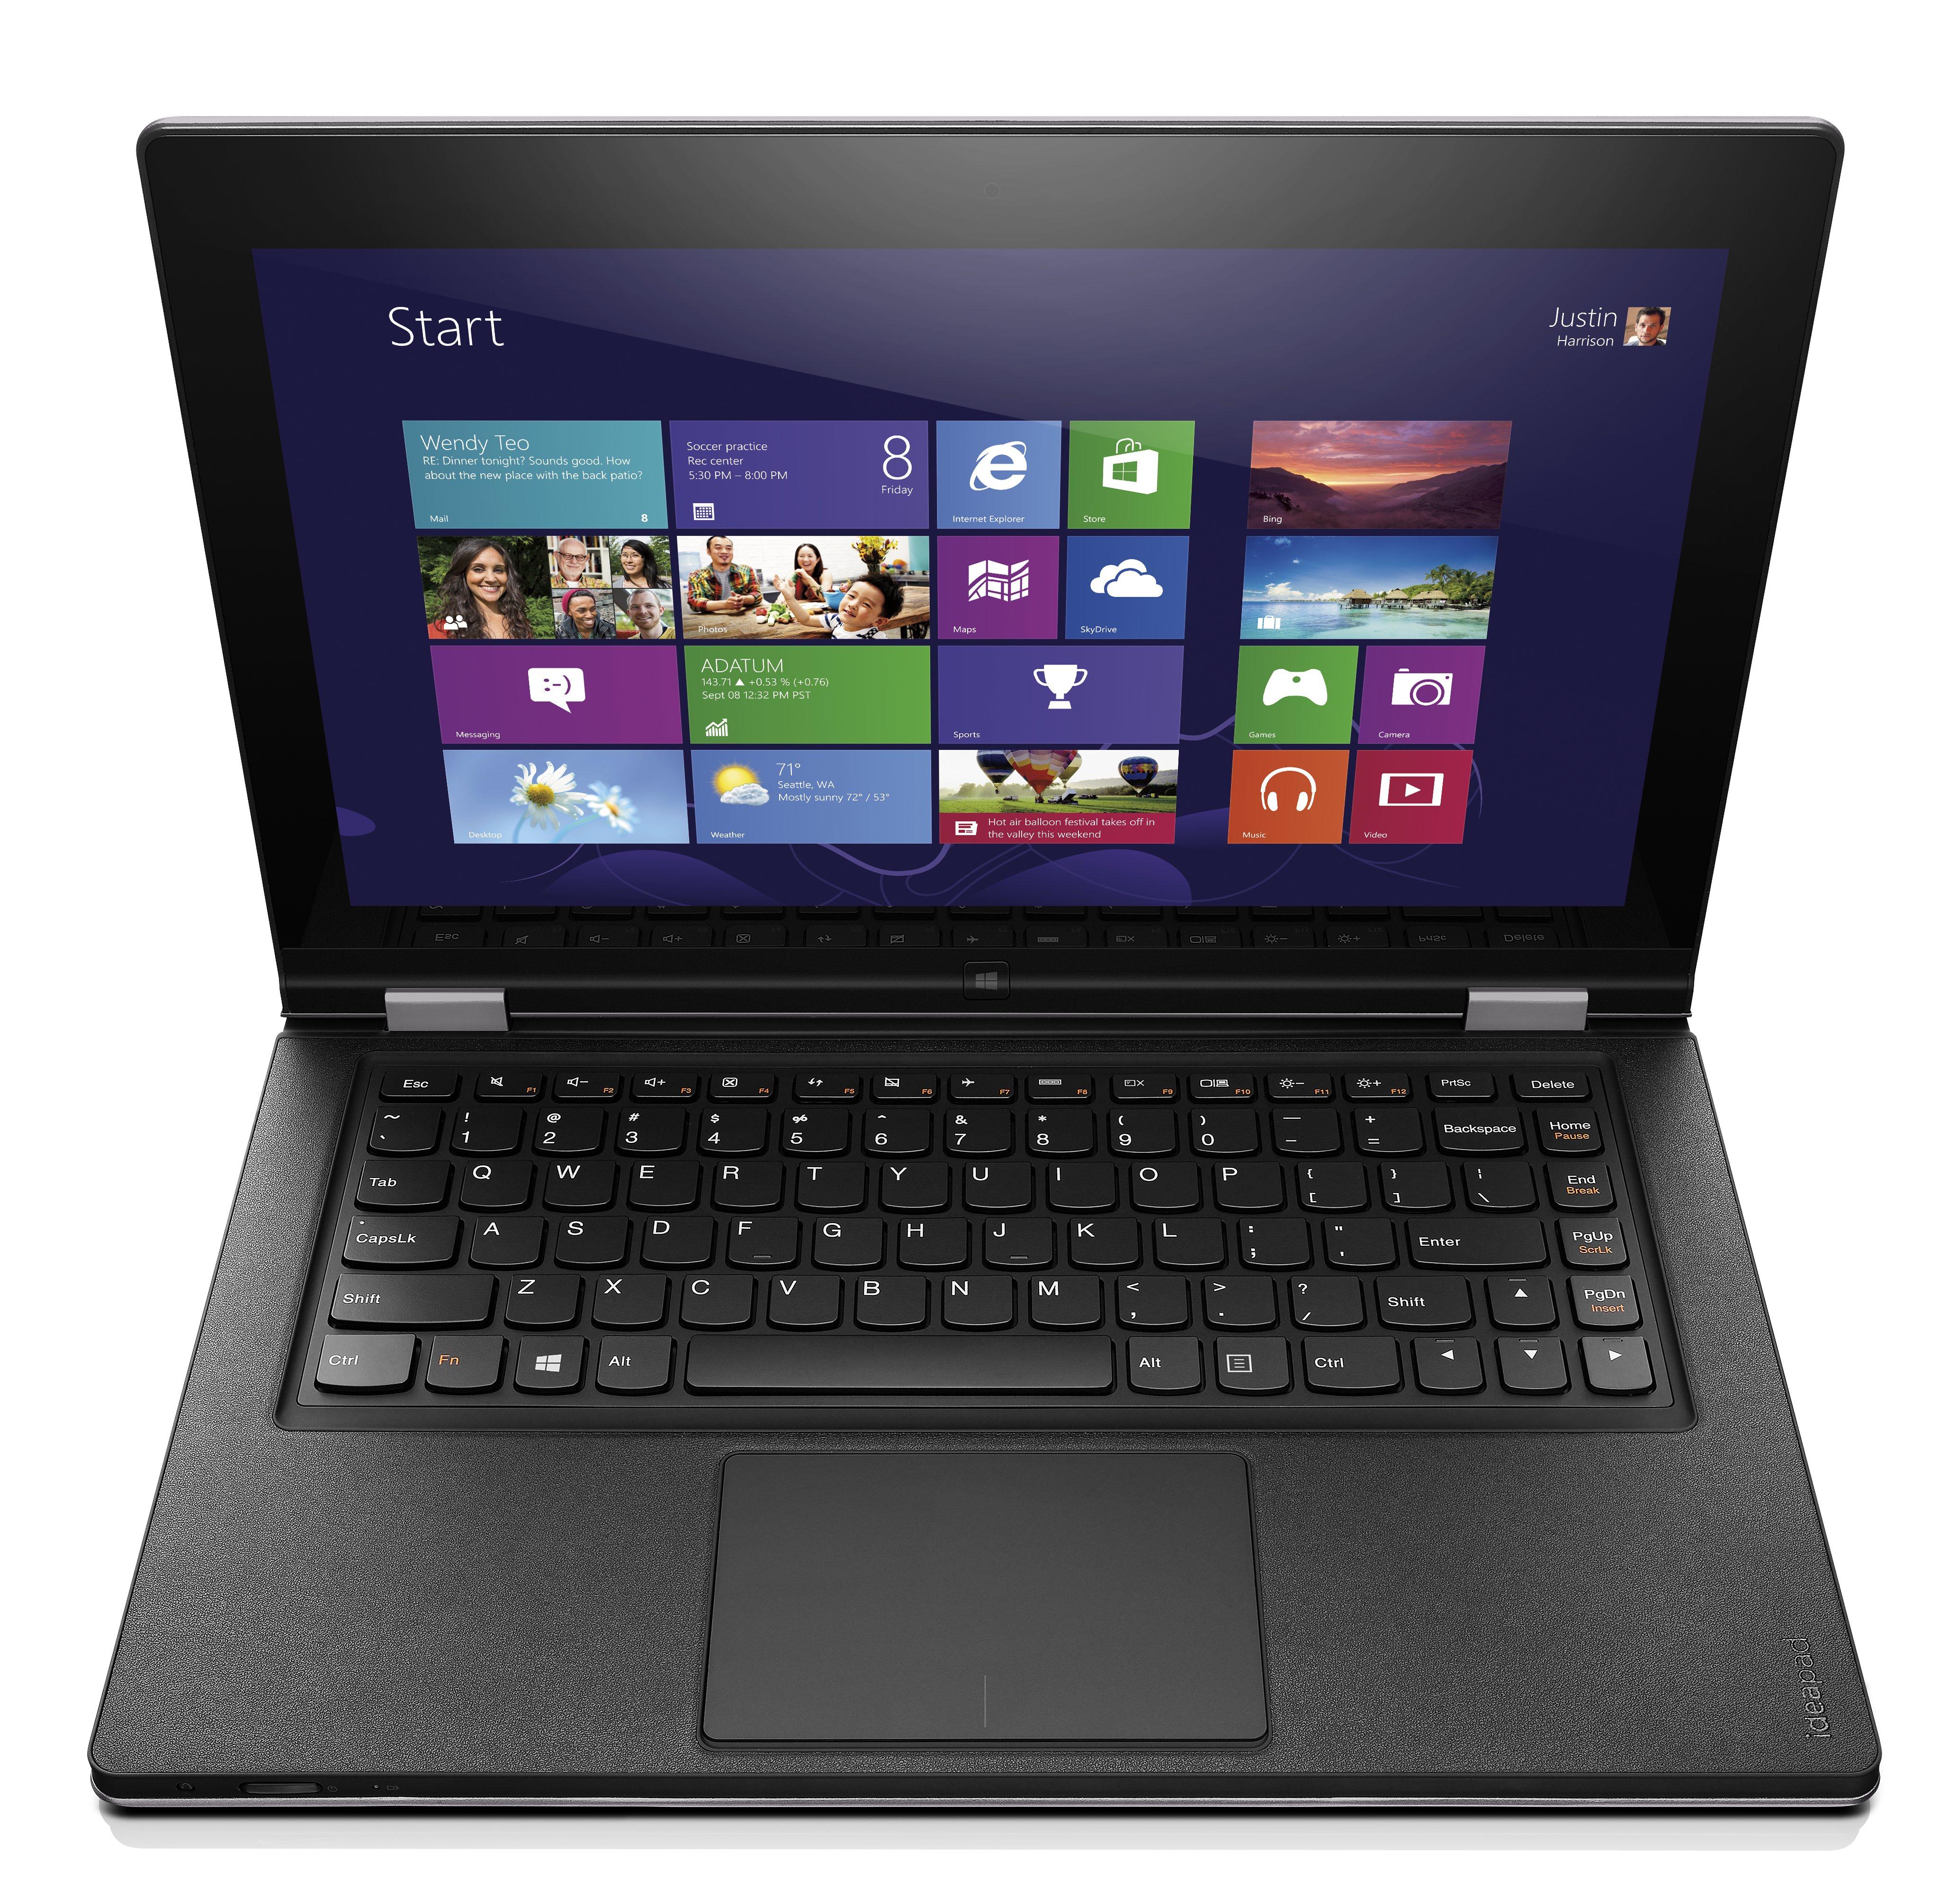 Lenovo Unveils IdeaPad Yoga 11, IdeaTab Lynx, ThinkPad ...